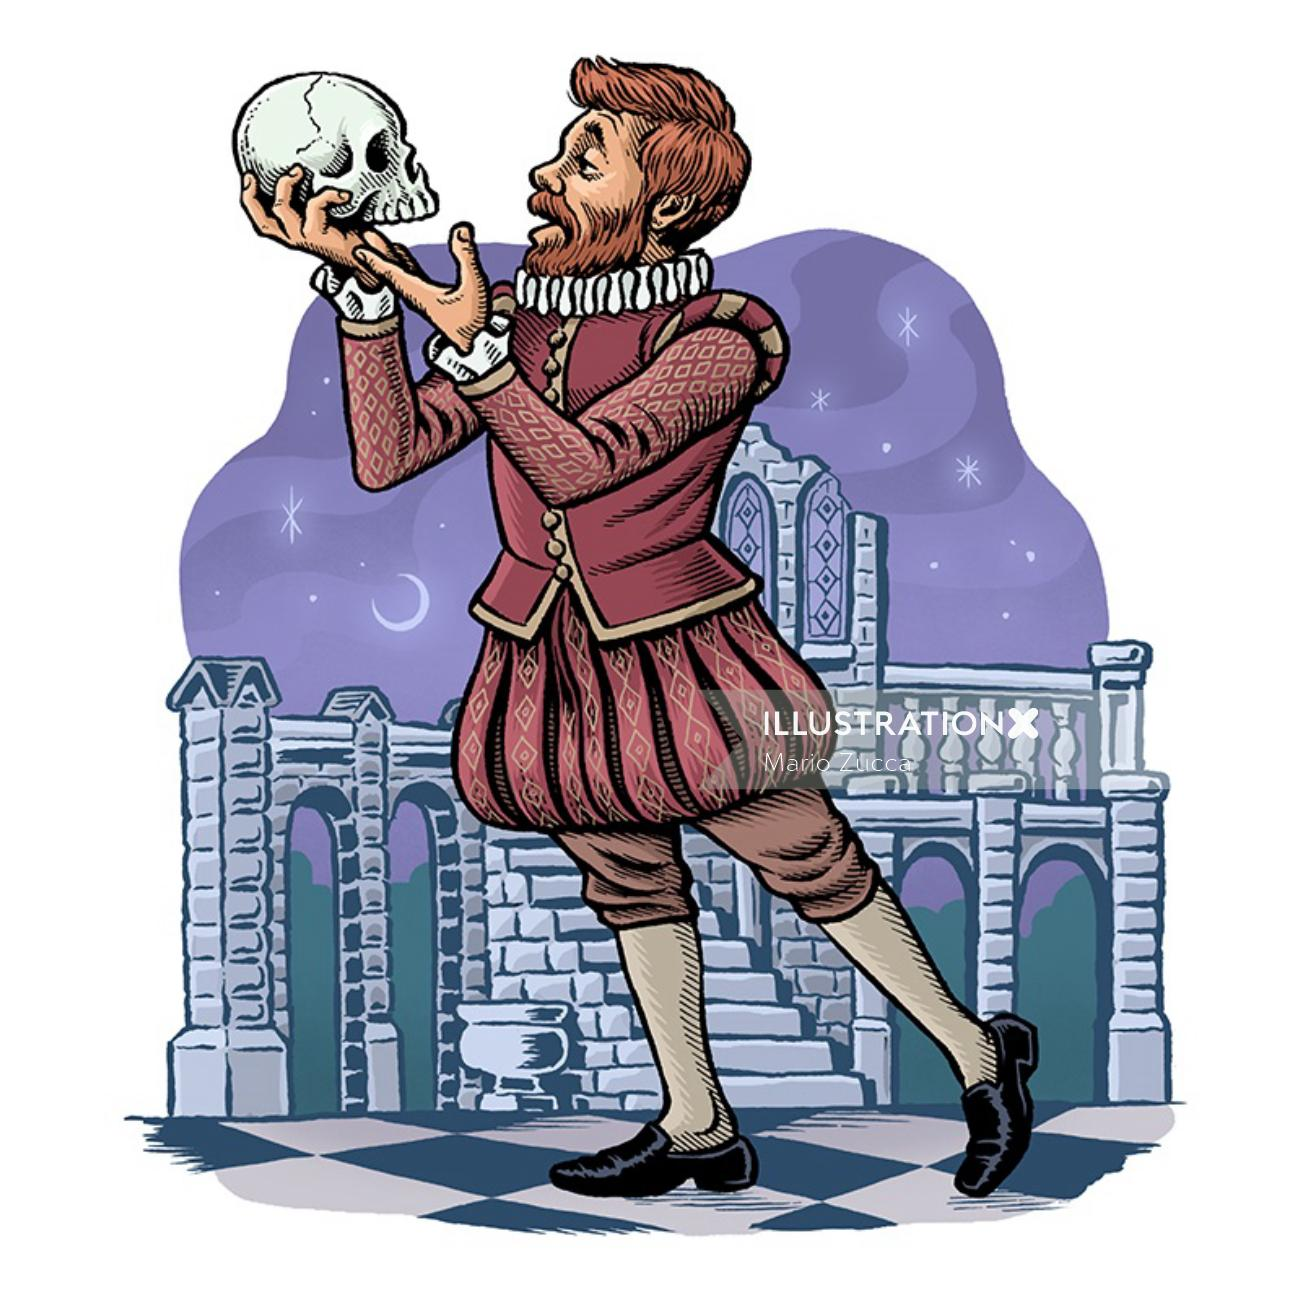 Book cover design by US based illustrator